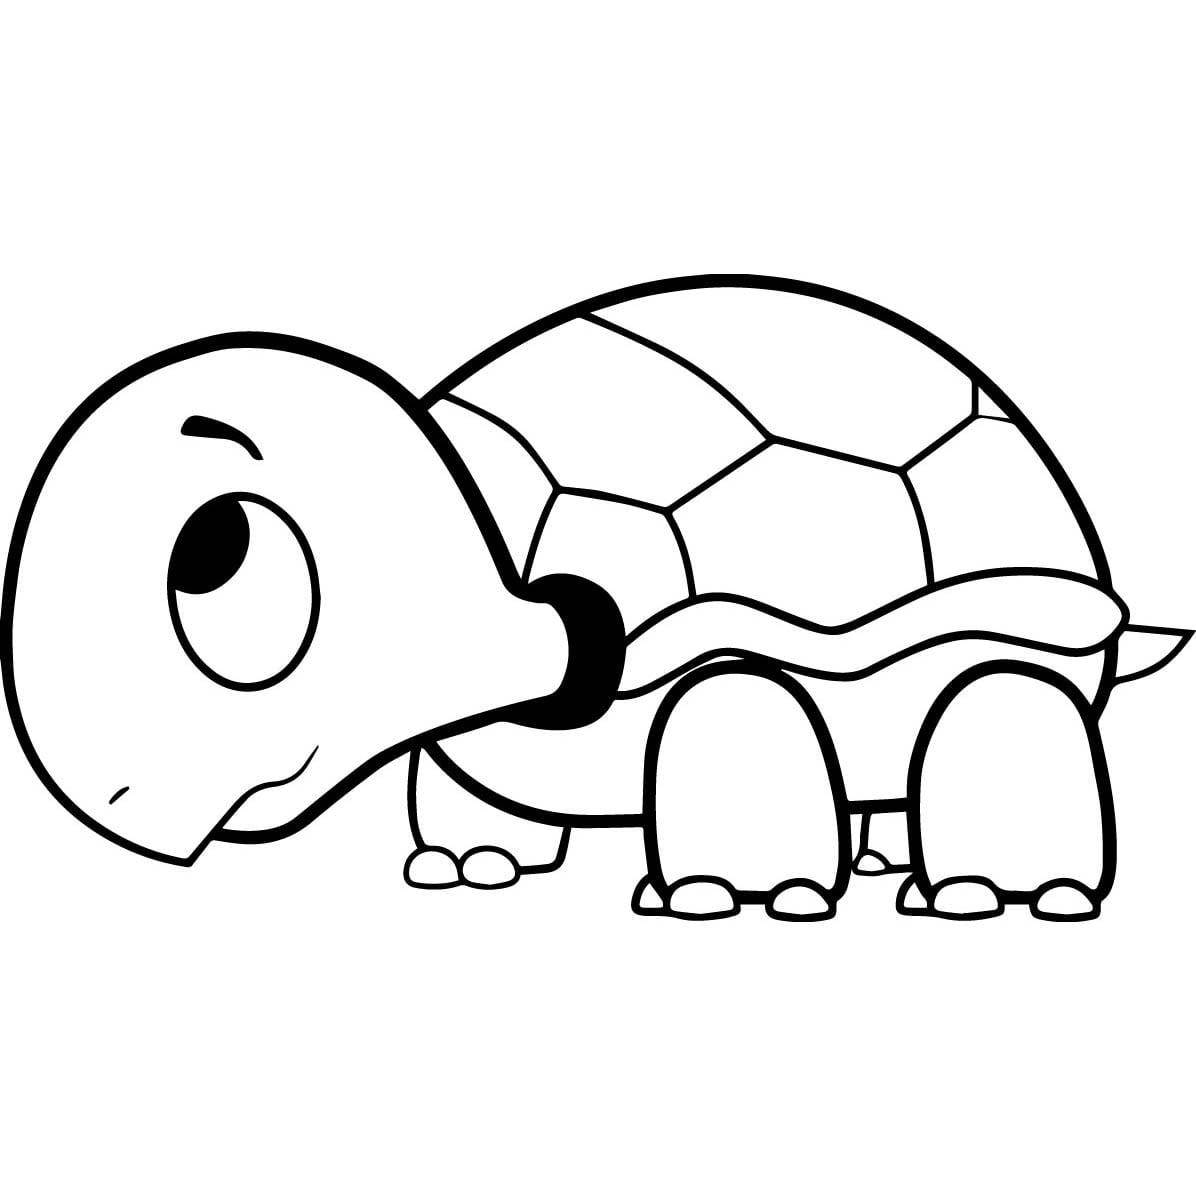 desenhos_de_tartaruga_para_colorir_1.jpg